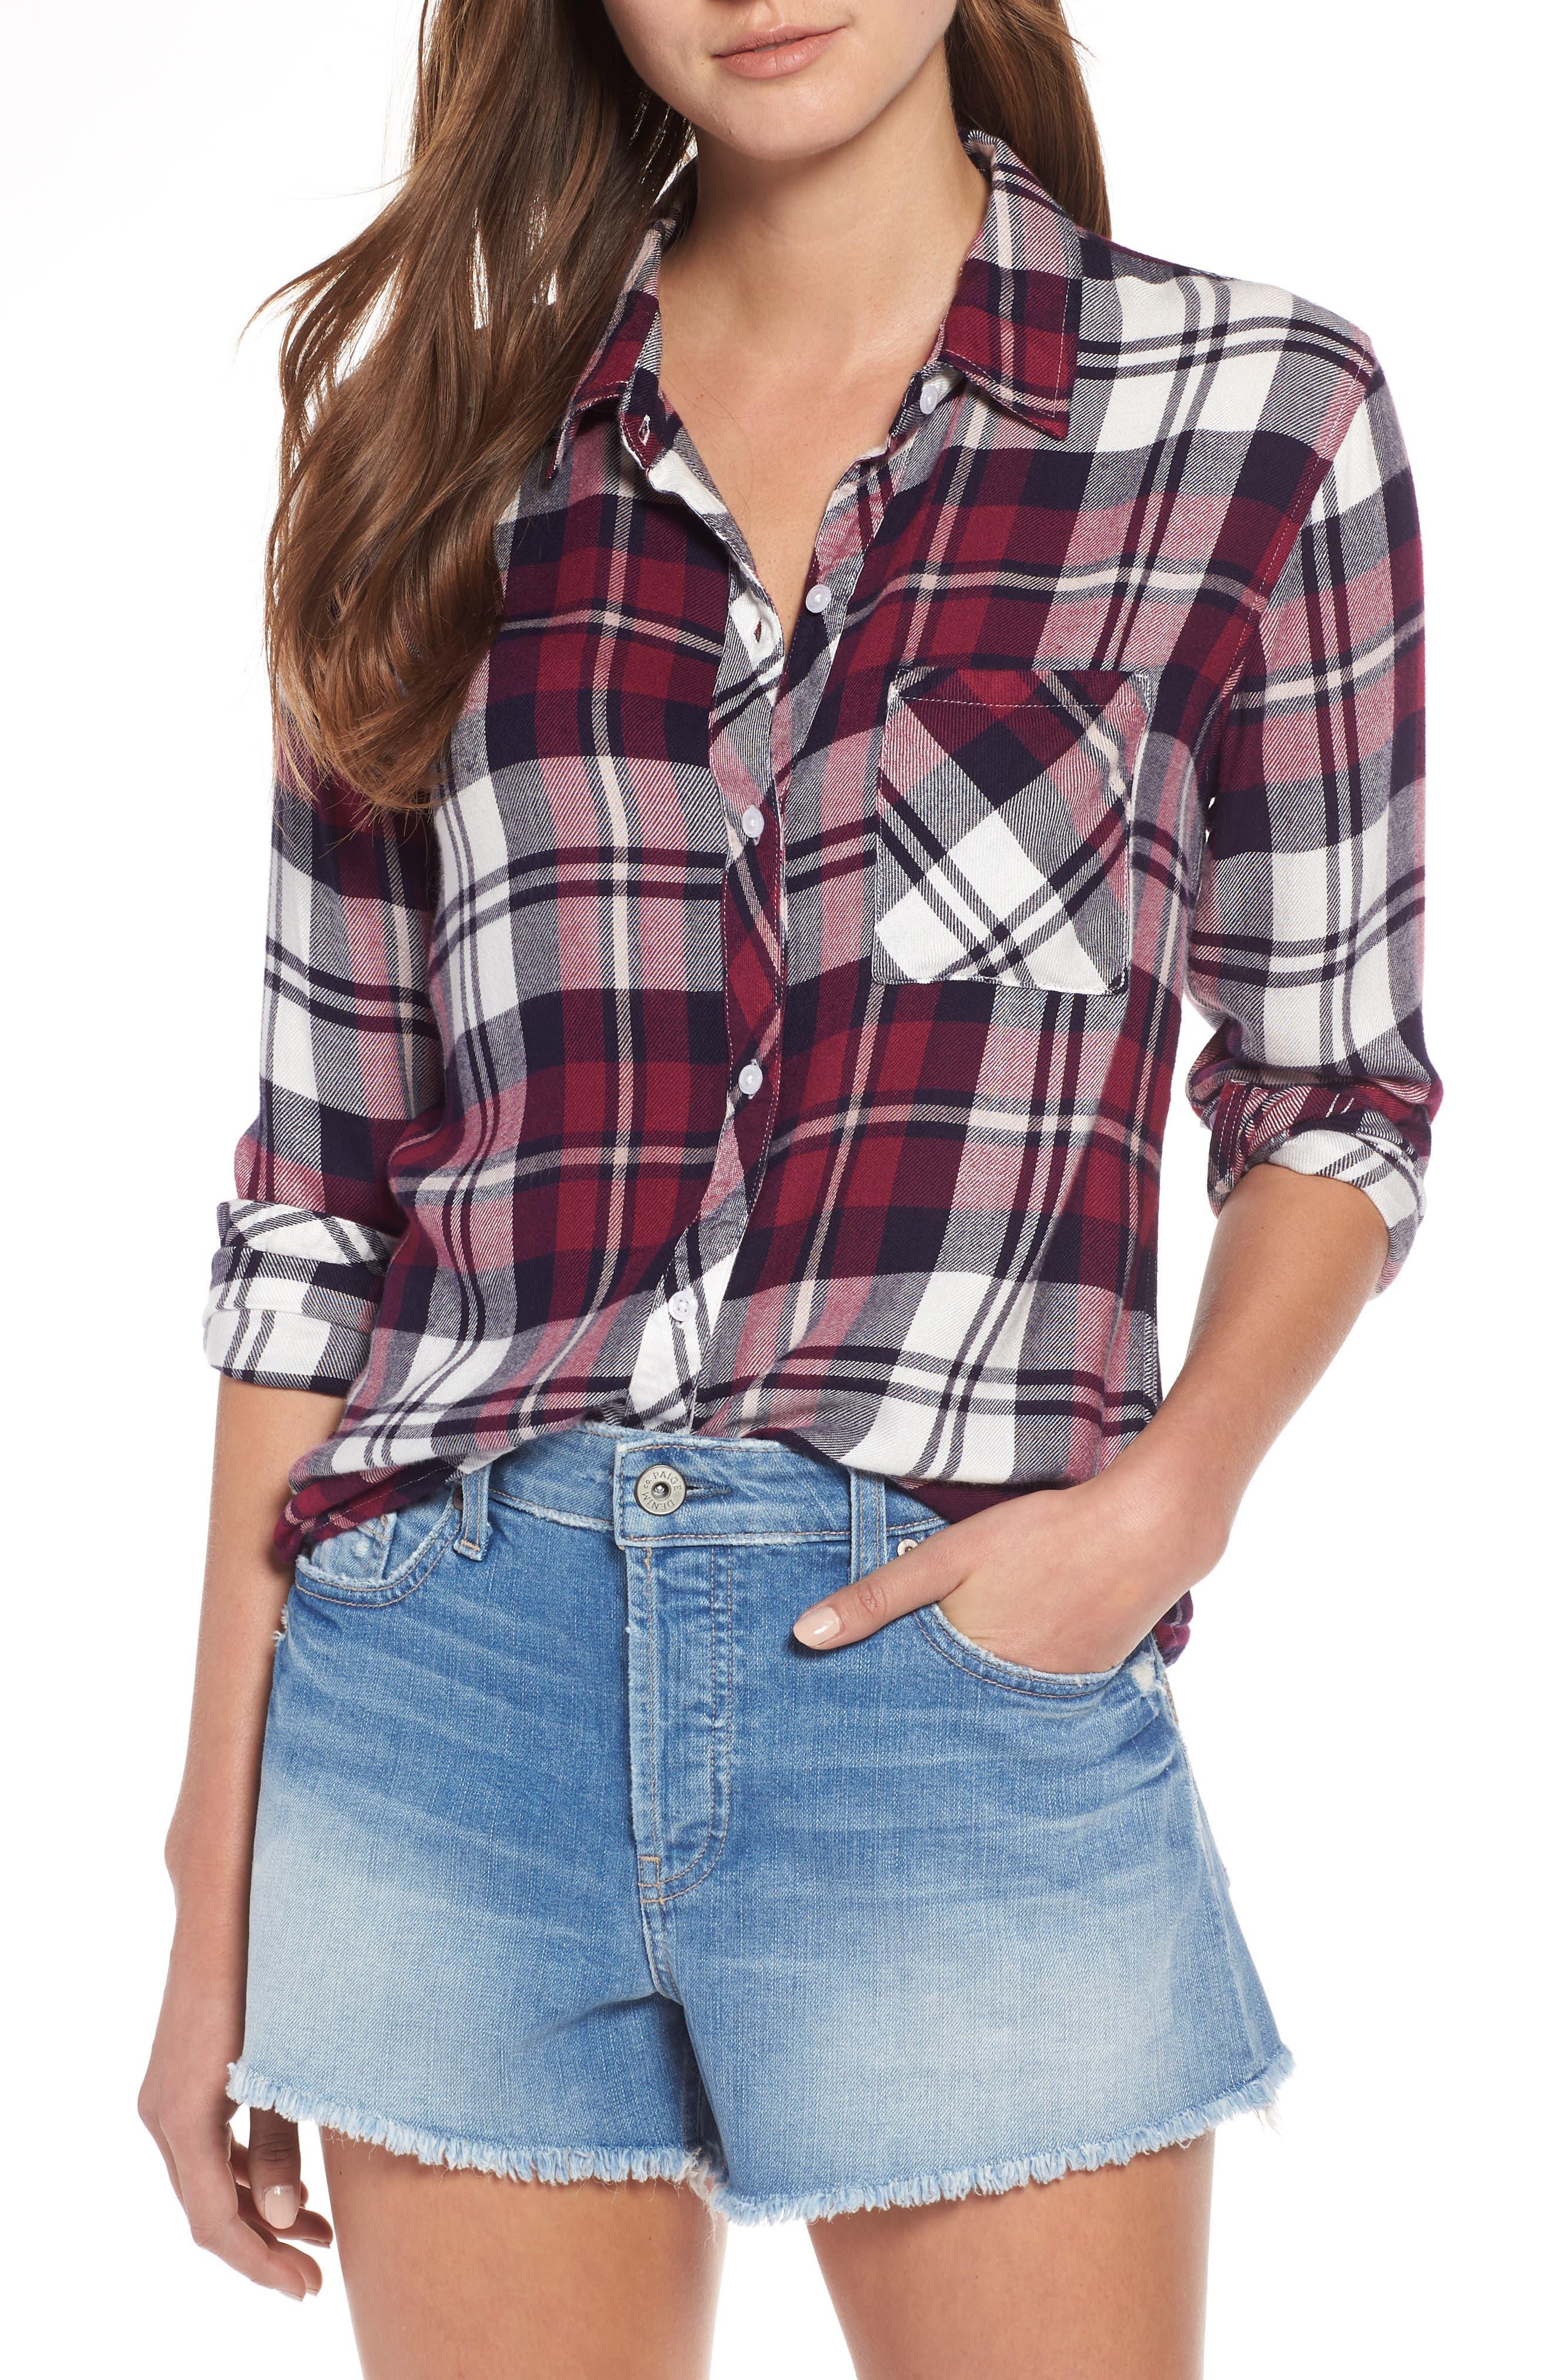 RAILS Hunter Plaid Button-Front Long-Sleeve Shirt in Fuchsia